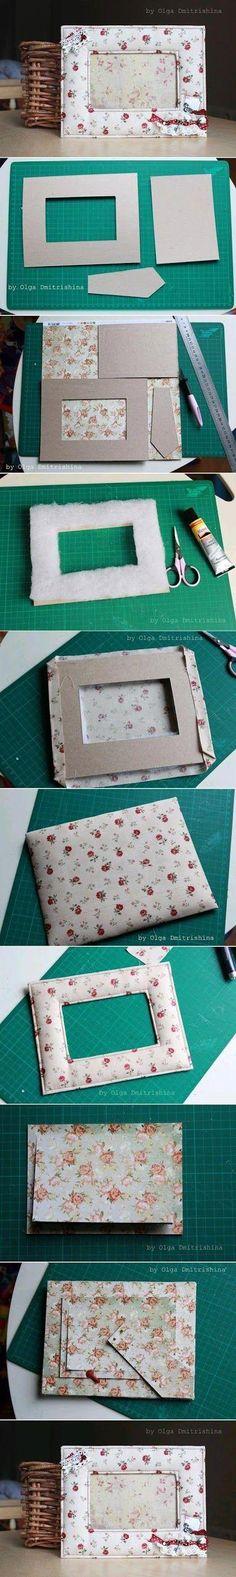 DIY Nice Soft Photo Frame | Pinterest | Easy, Craft and Crafty